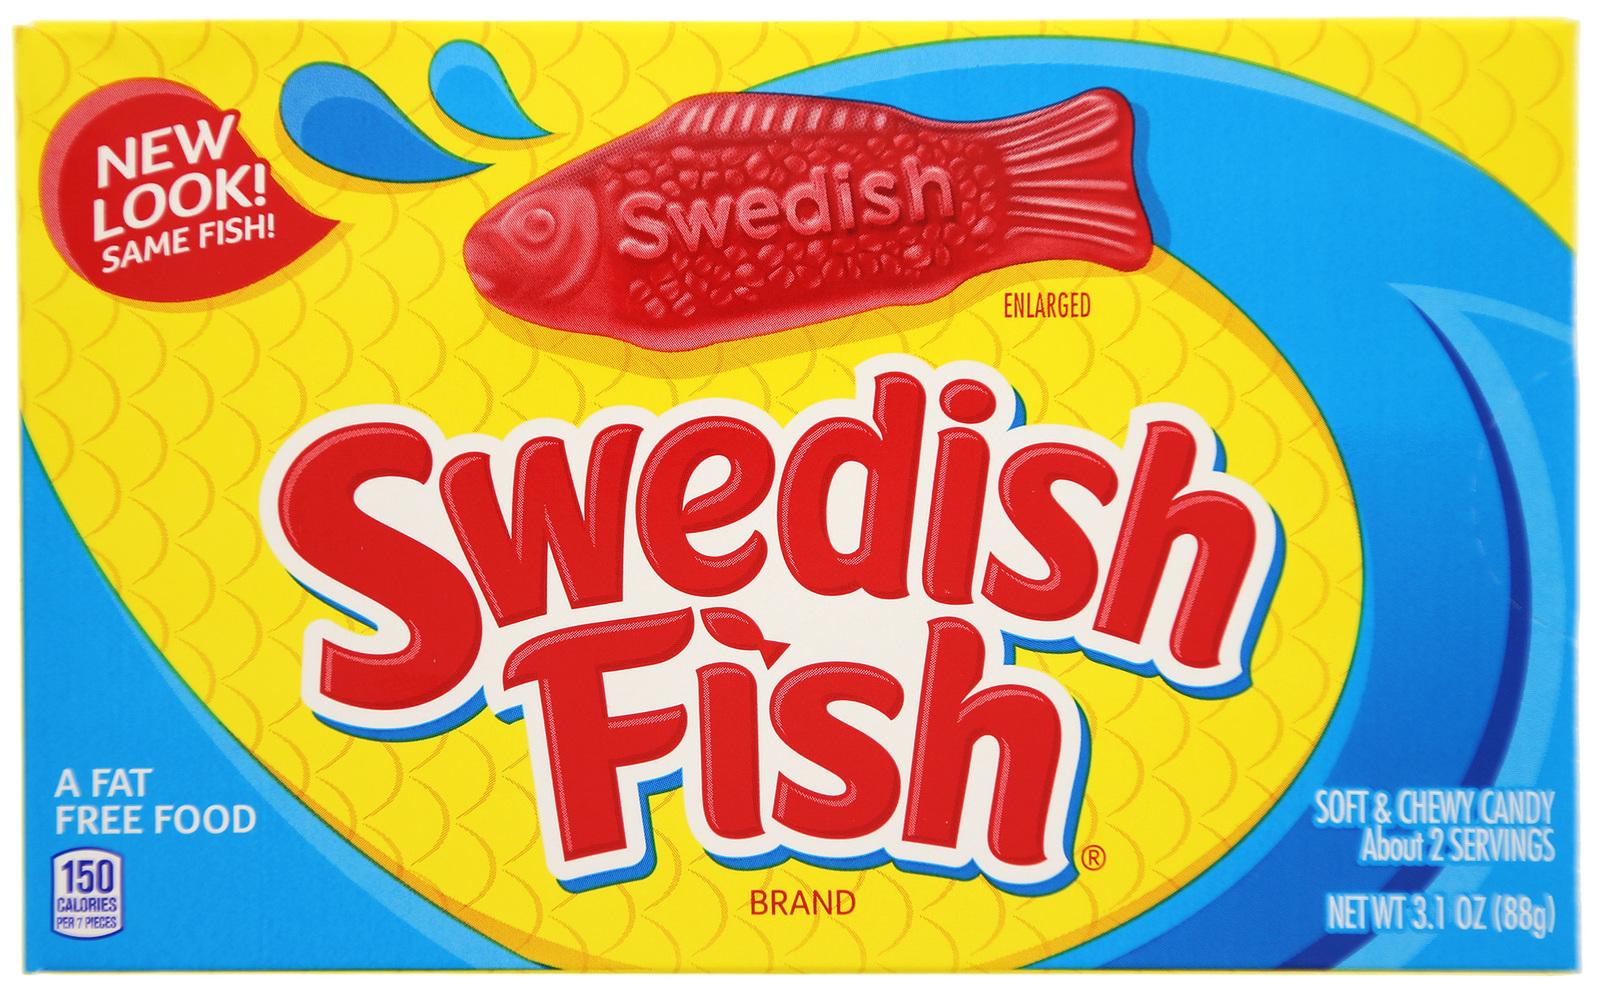 Swedish Fish Red Theater Box (88gm) image